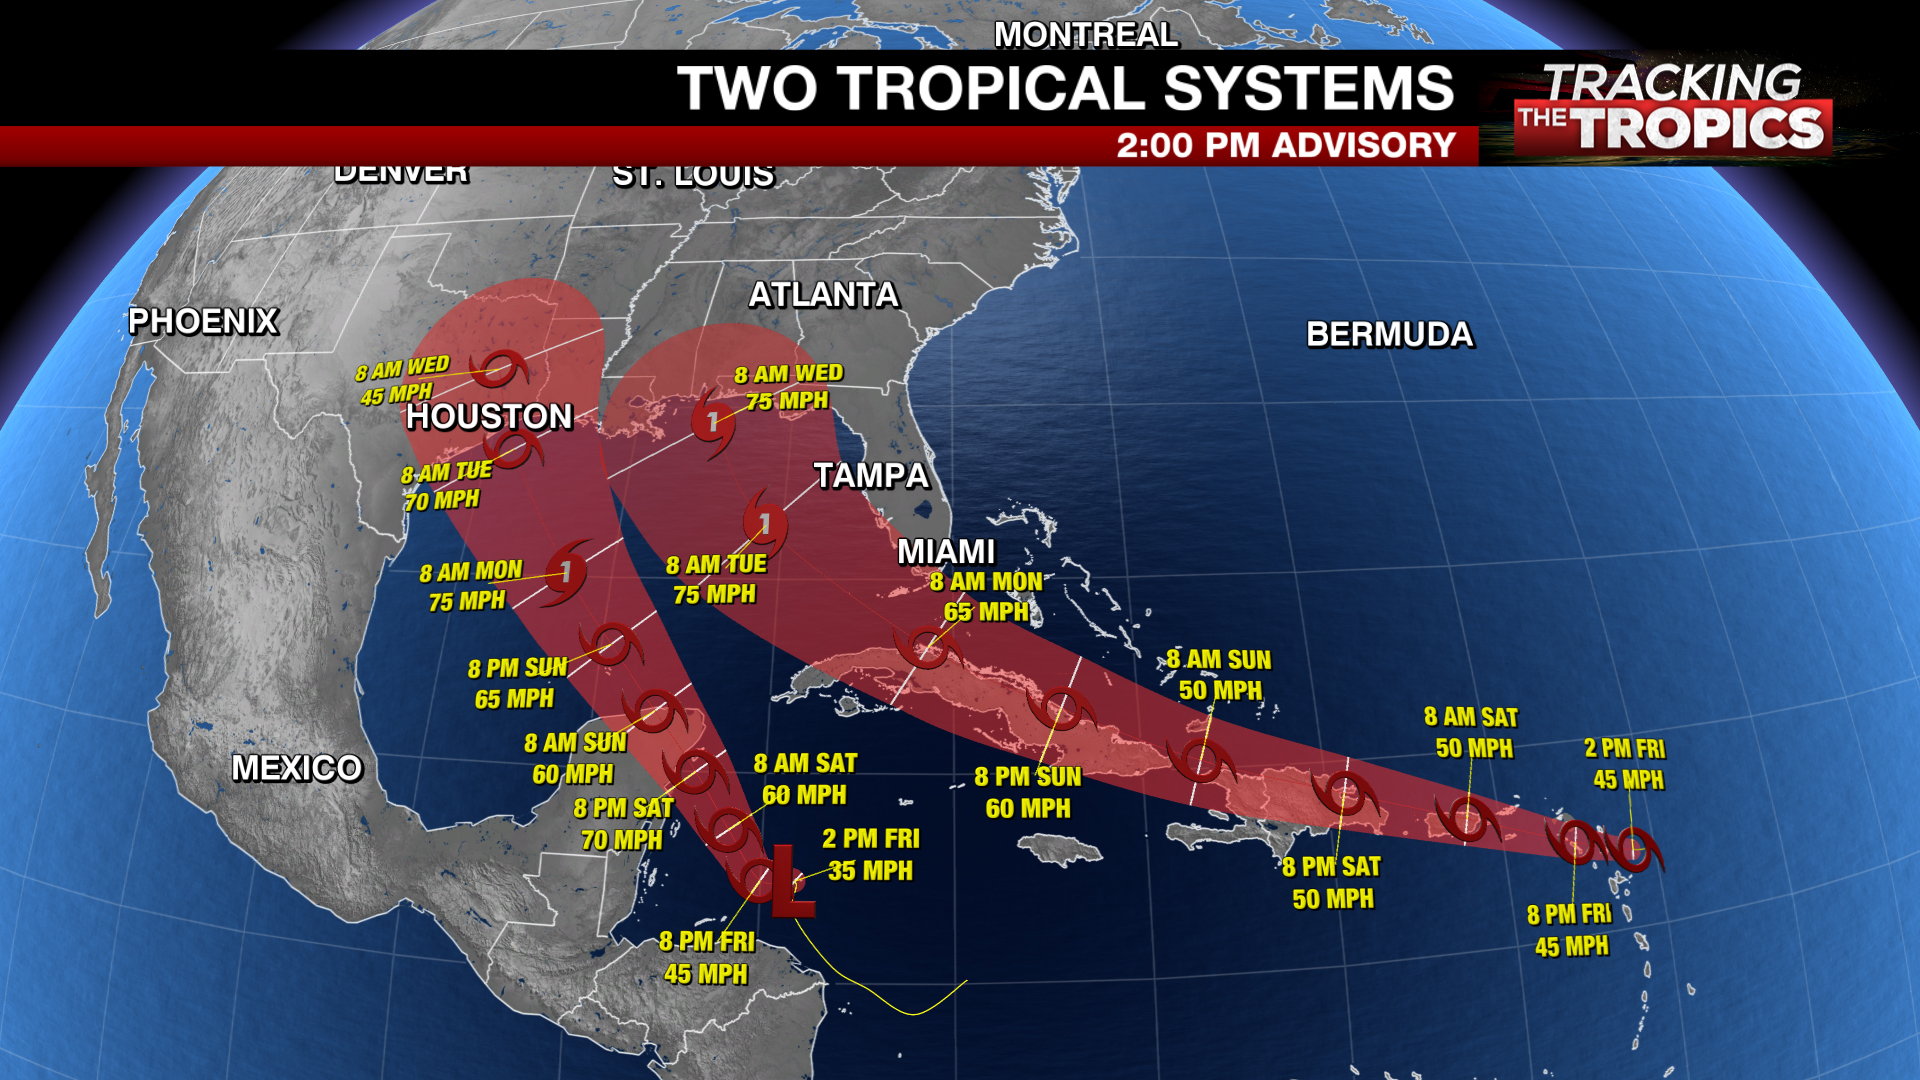 Brproud West Baton Rouge Ask Locals To Begin Storm Preparations